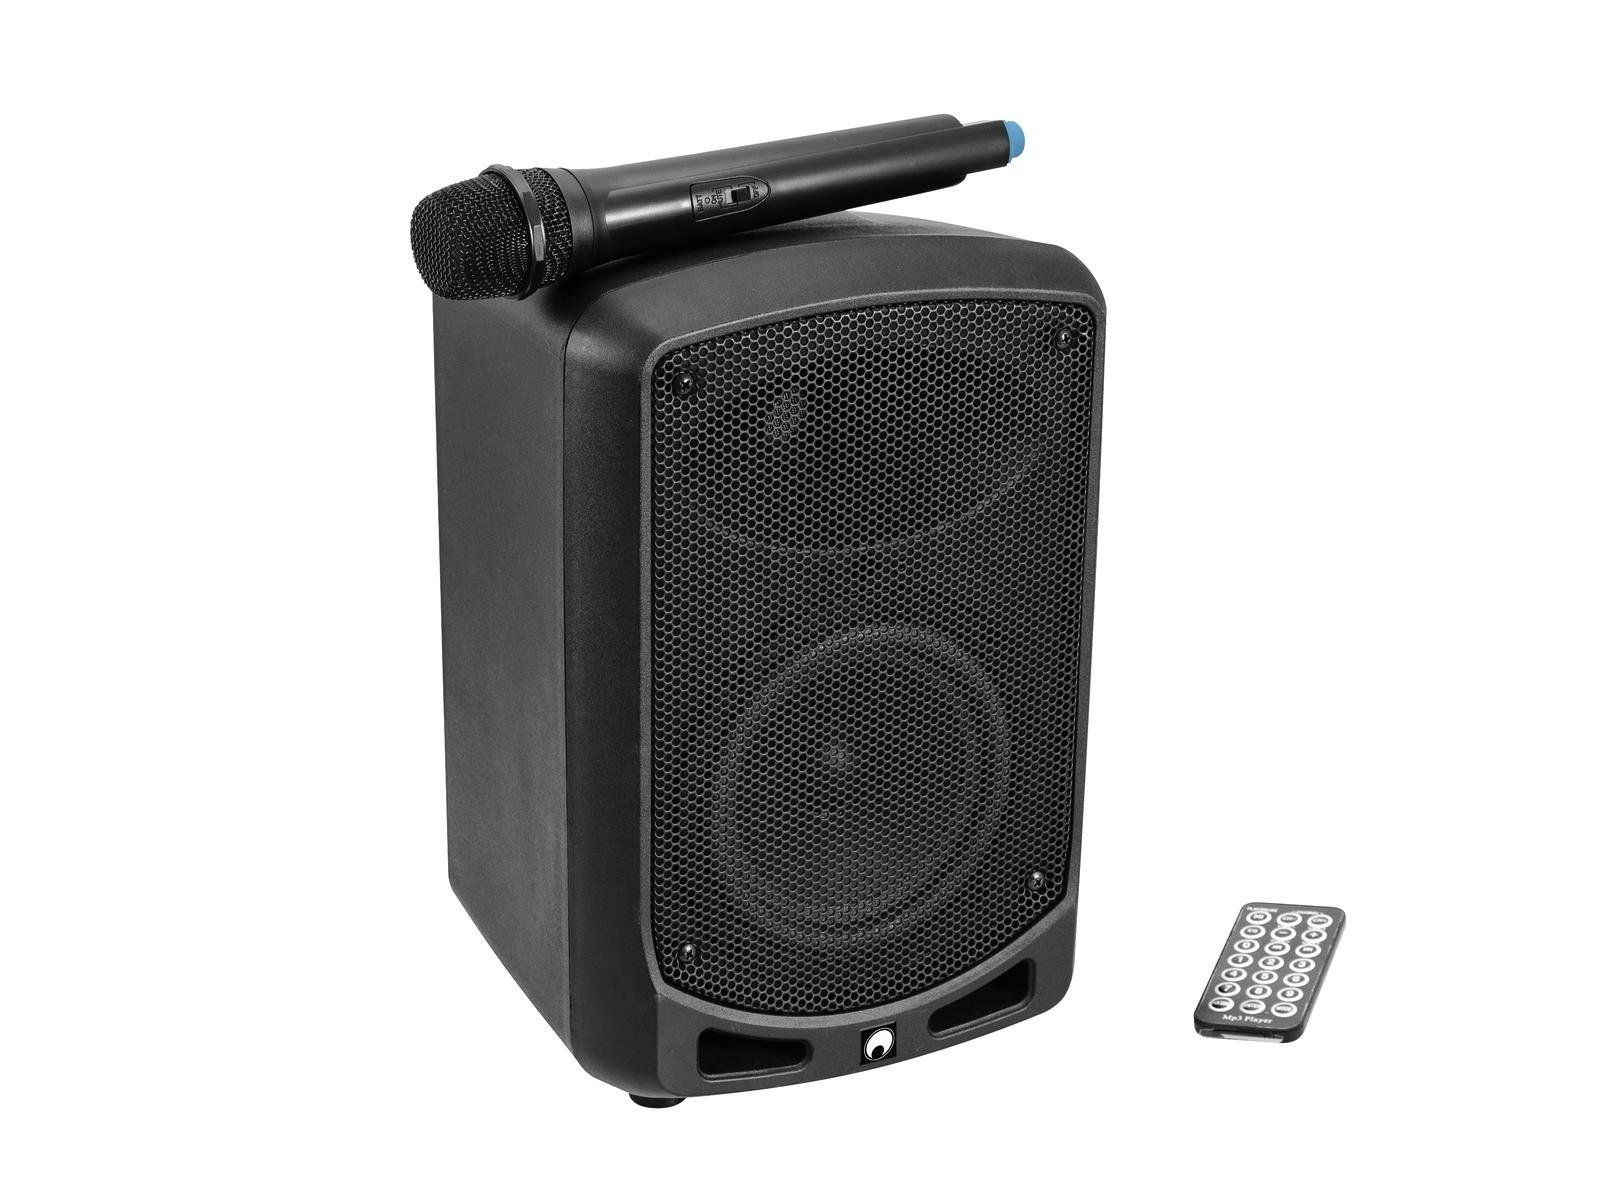 OMNITRONIC WAMS-65BT Drahtlos-PA-System mit Funkmikrofon, Audioplayer, Bluetooth